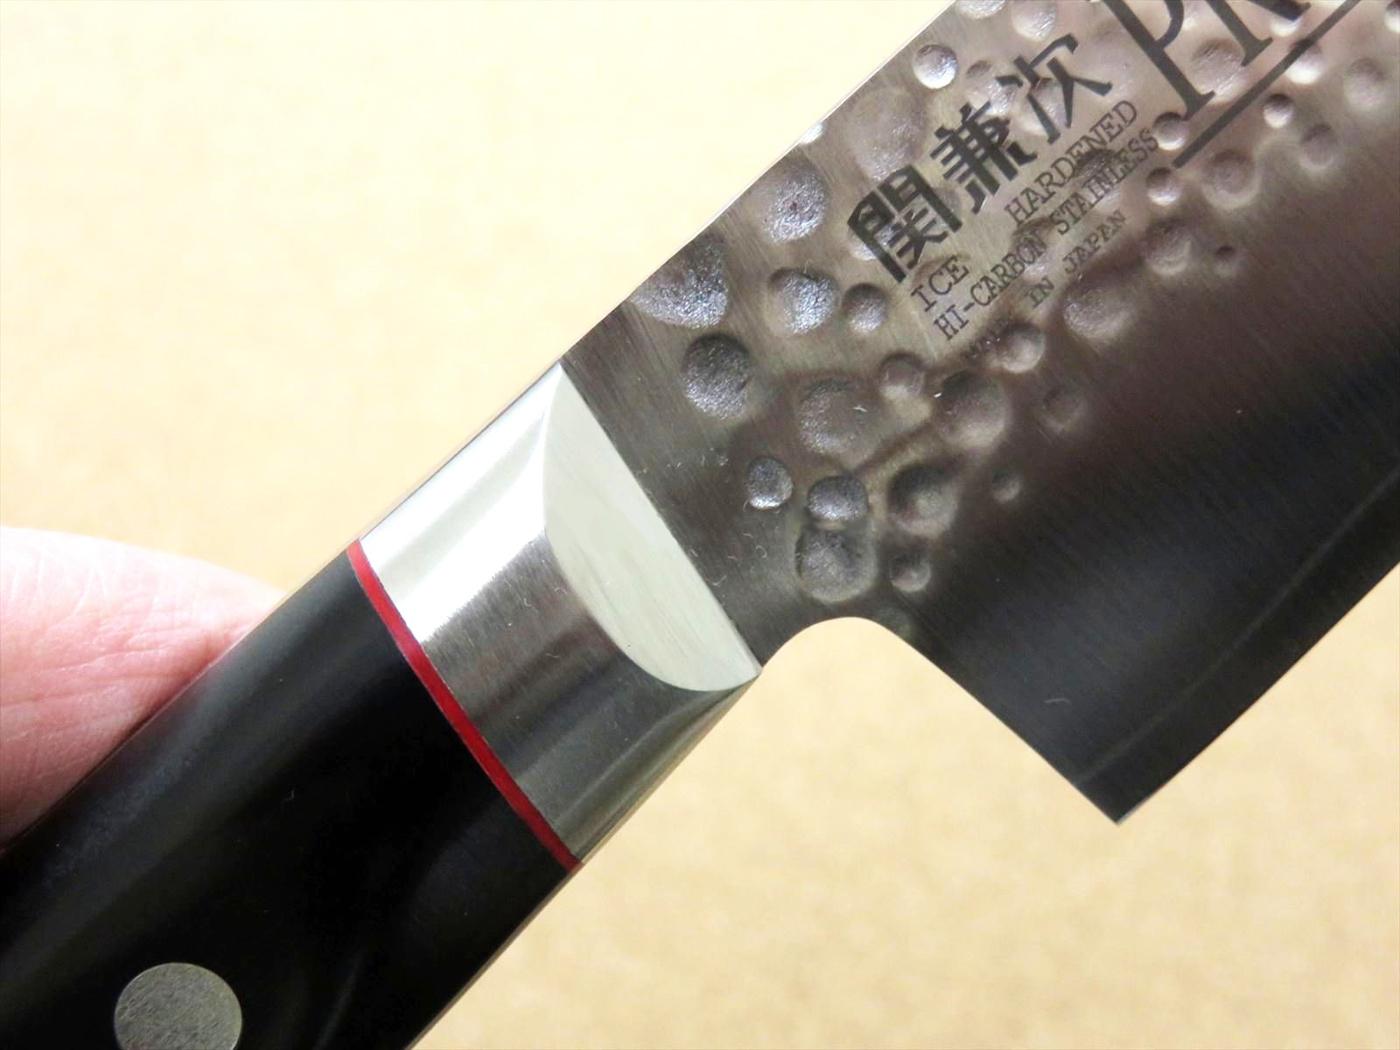 Фото 7 - Кухонный нож Сантоку, Pro-J, Kanetsugu, 6003, сталь VG-10, в картонной коробке